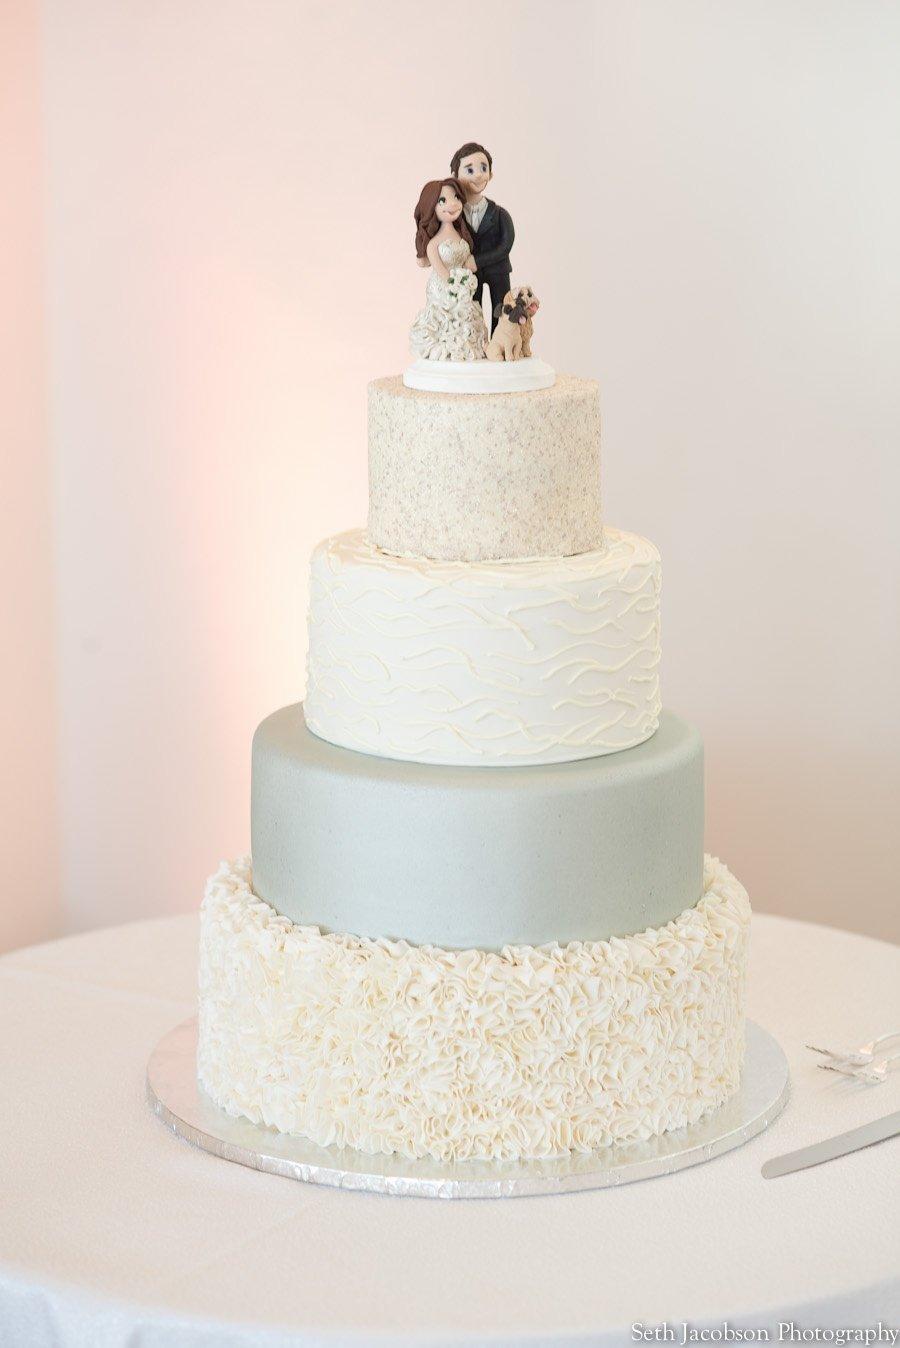 Delicious Custom Cakes